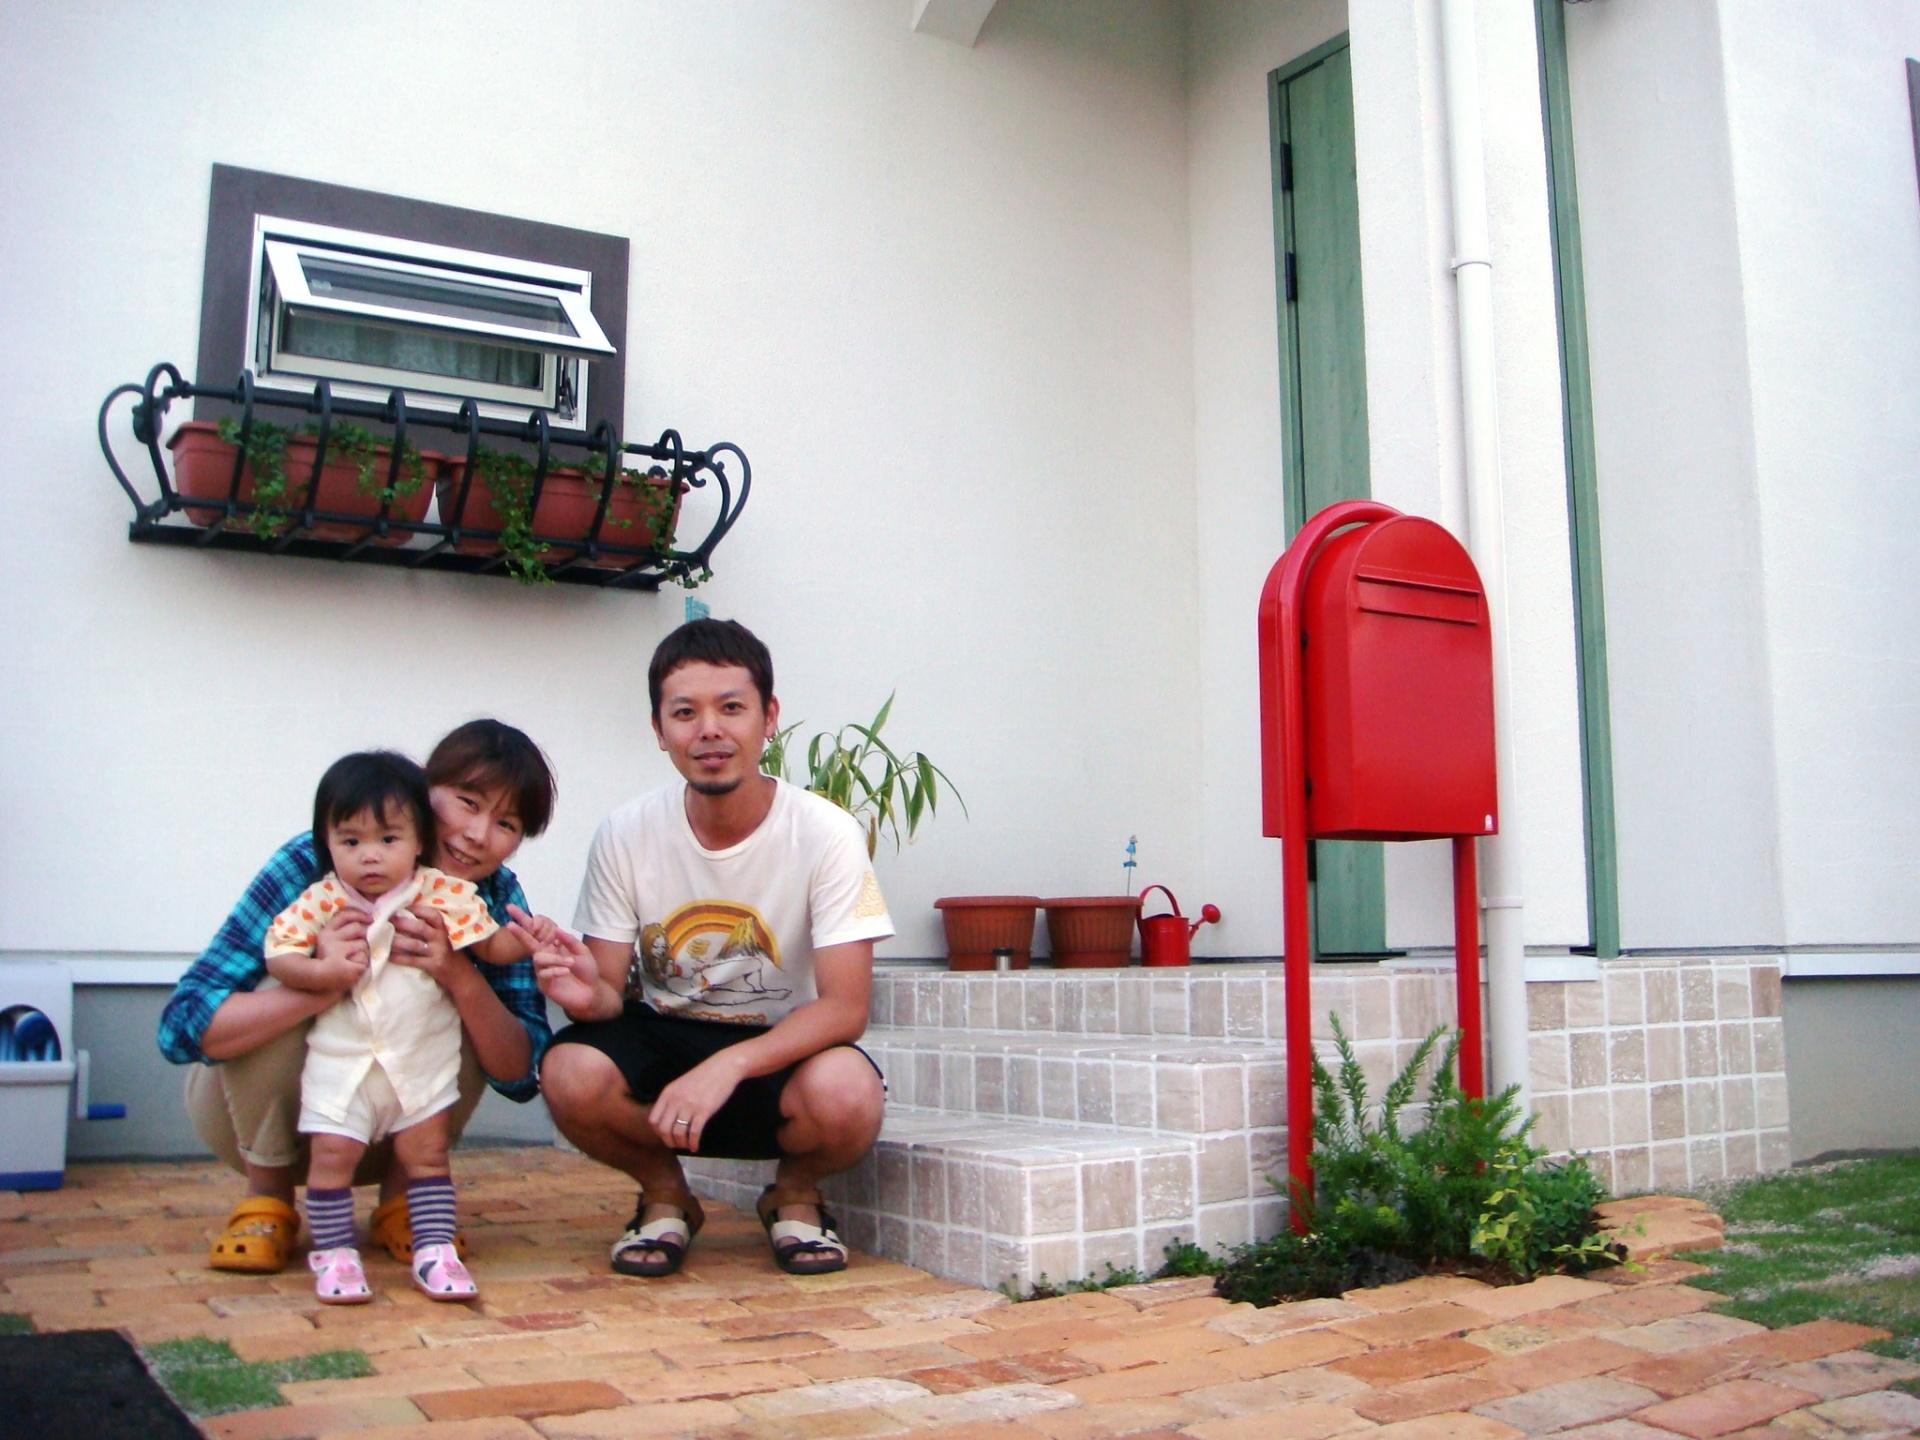 姫路市S様 ご家族写真